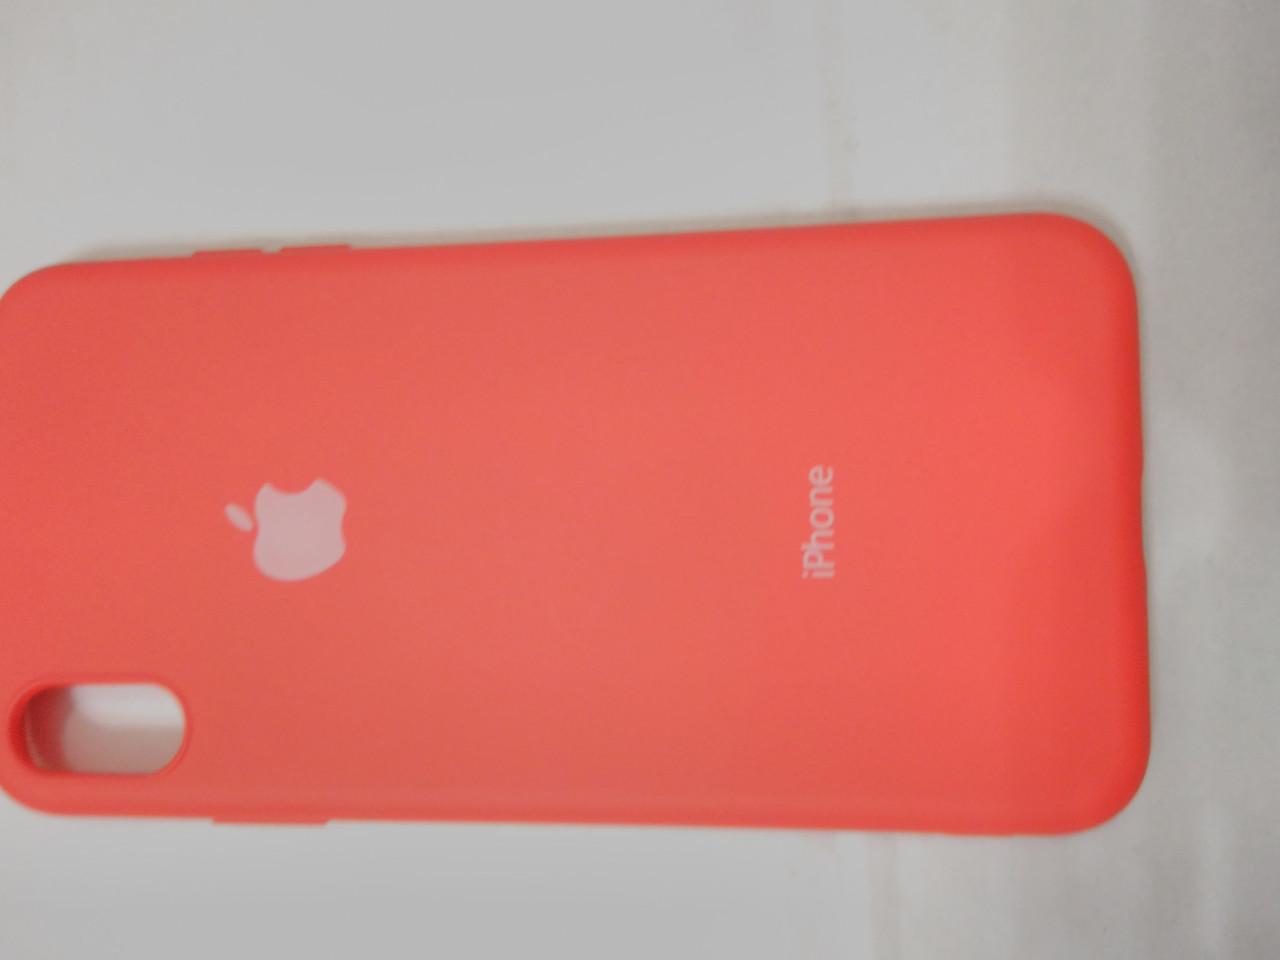 Накладка   Silicon Cover full   для  iPhone  XS  MAX 6.5  (красный)